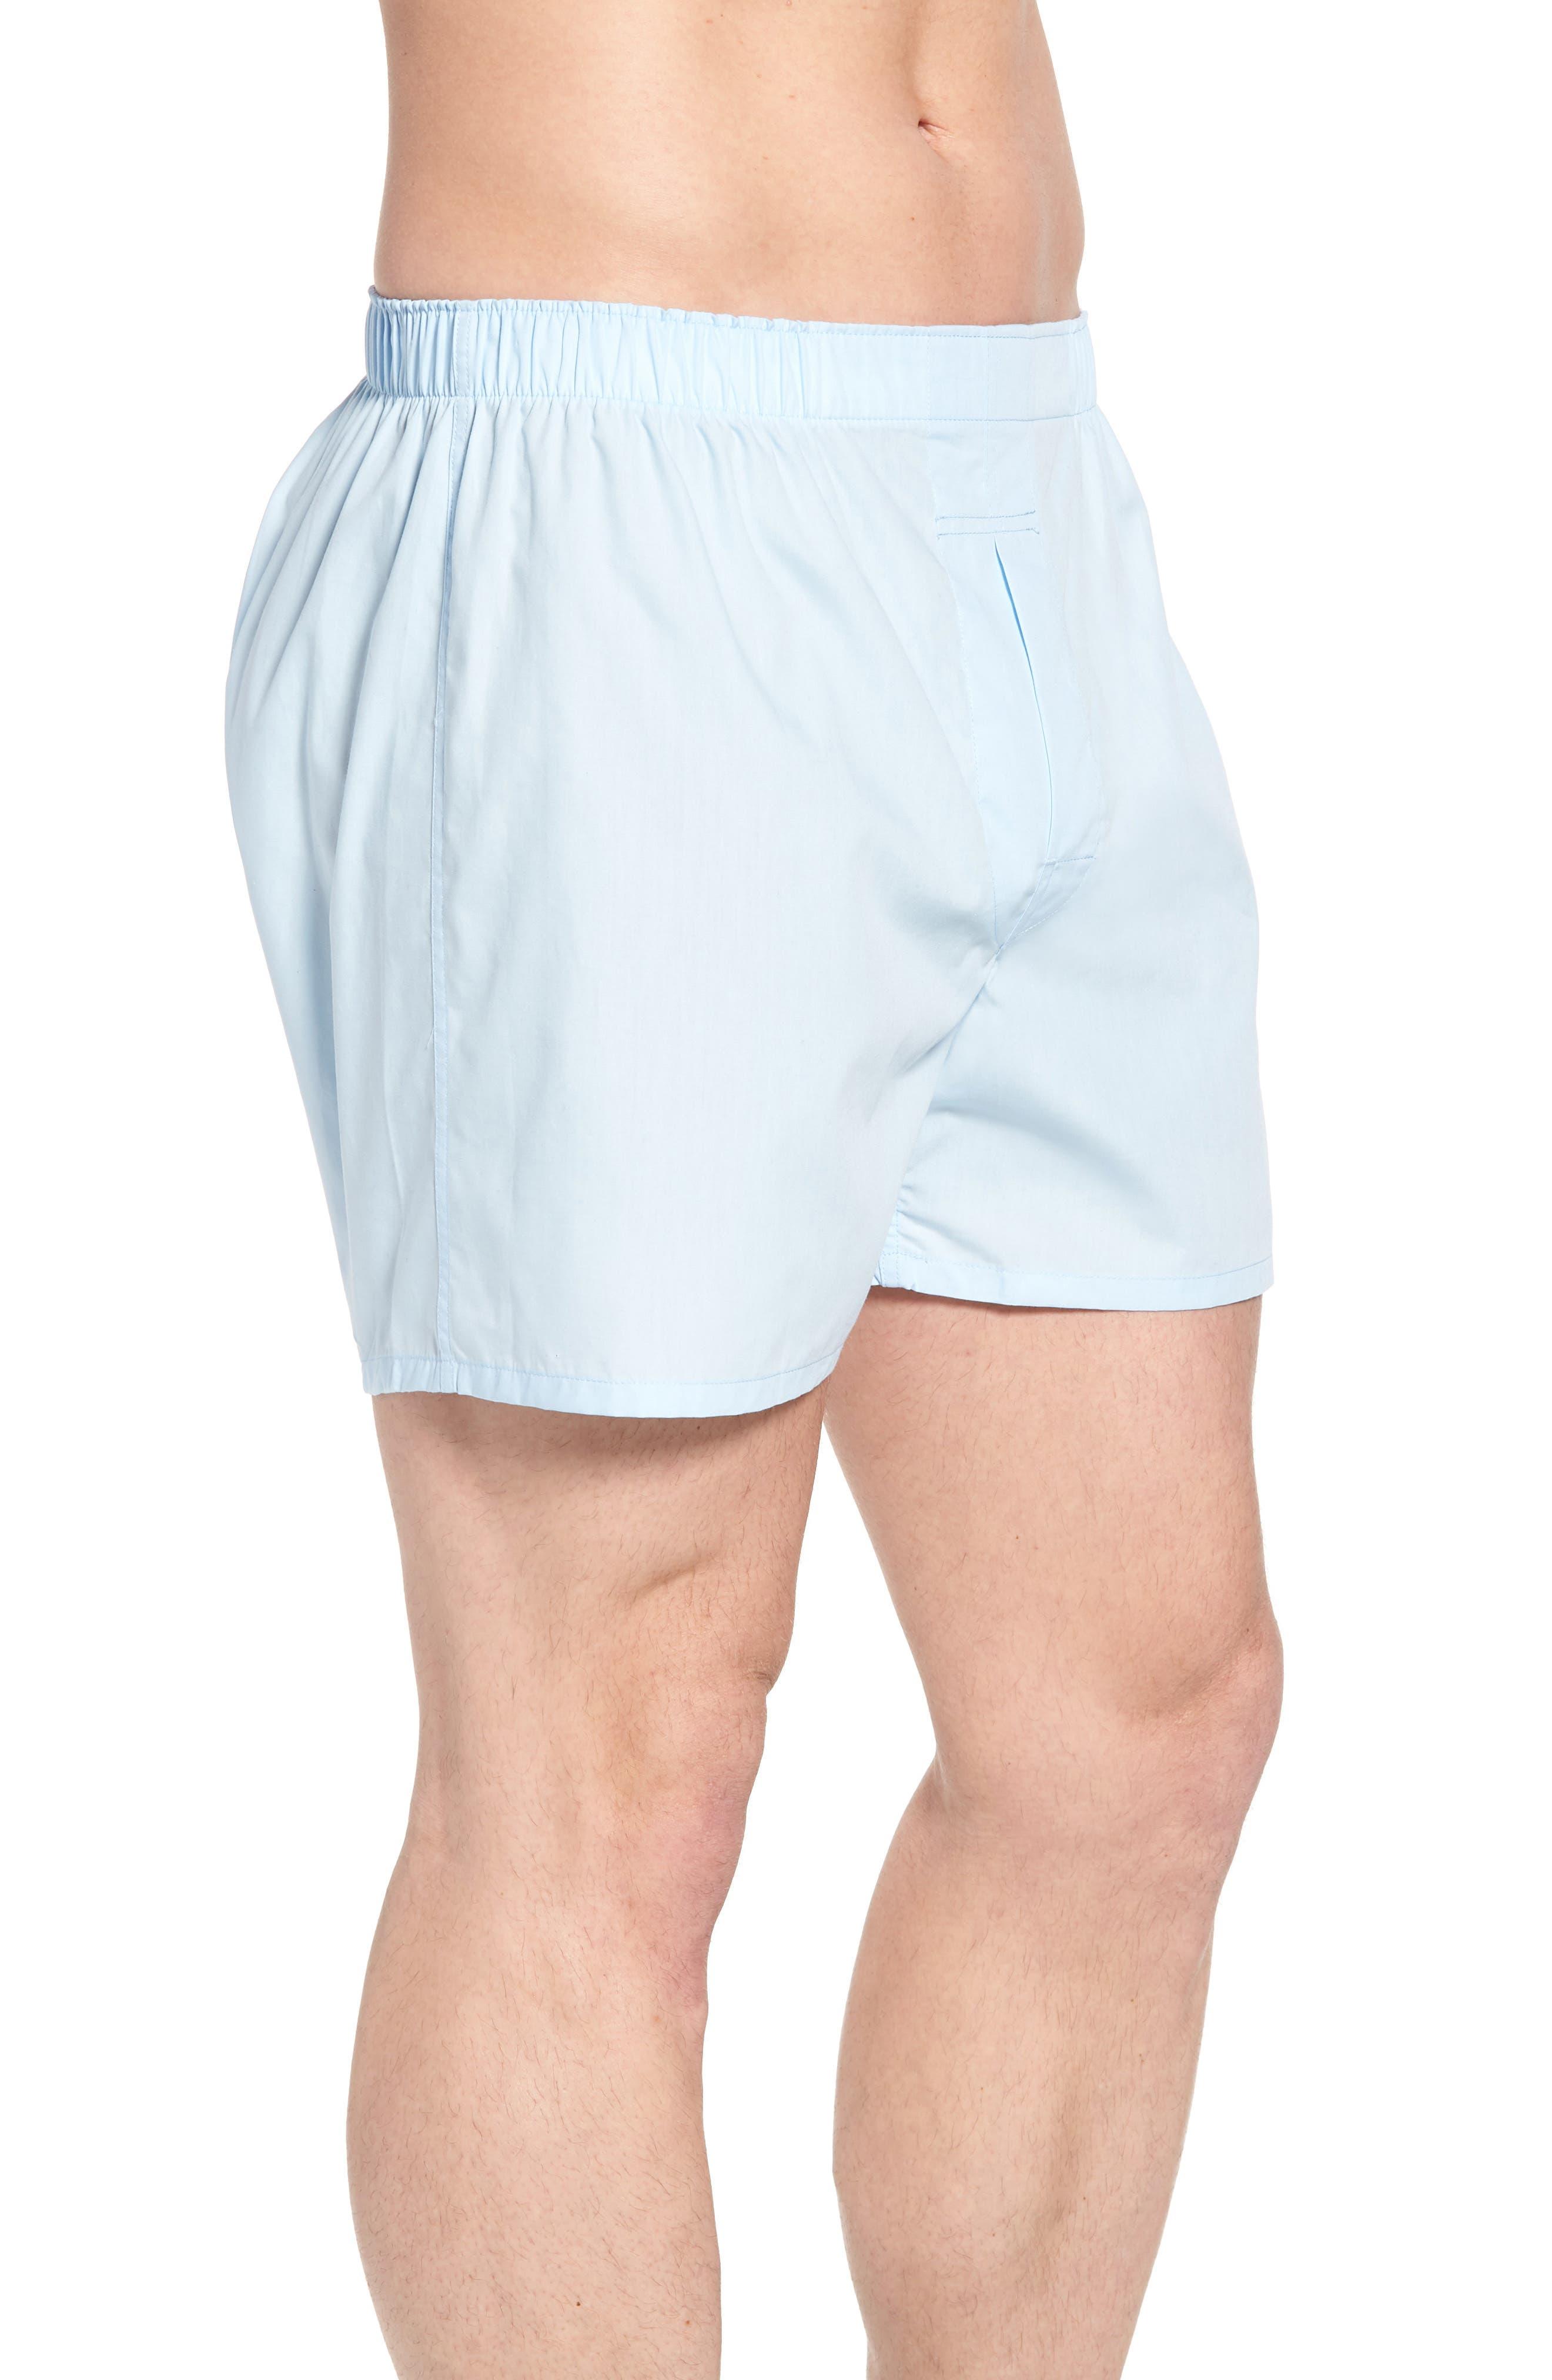 3-Pack Cotton Boxers,                             Alternate thumbnail 4, color,                             WHITE/ LIGHT BLUE/ CRUISE NAVY